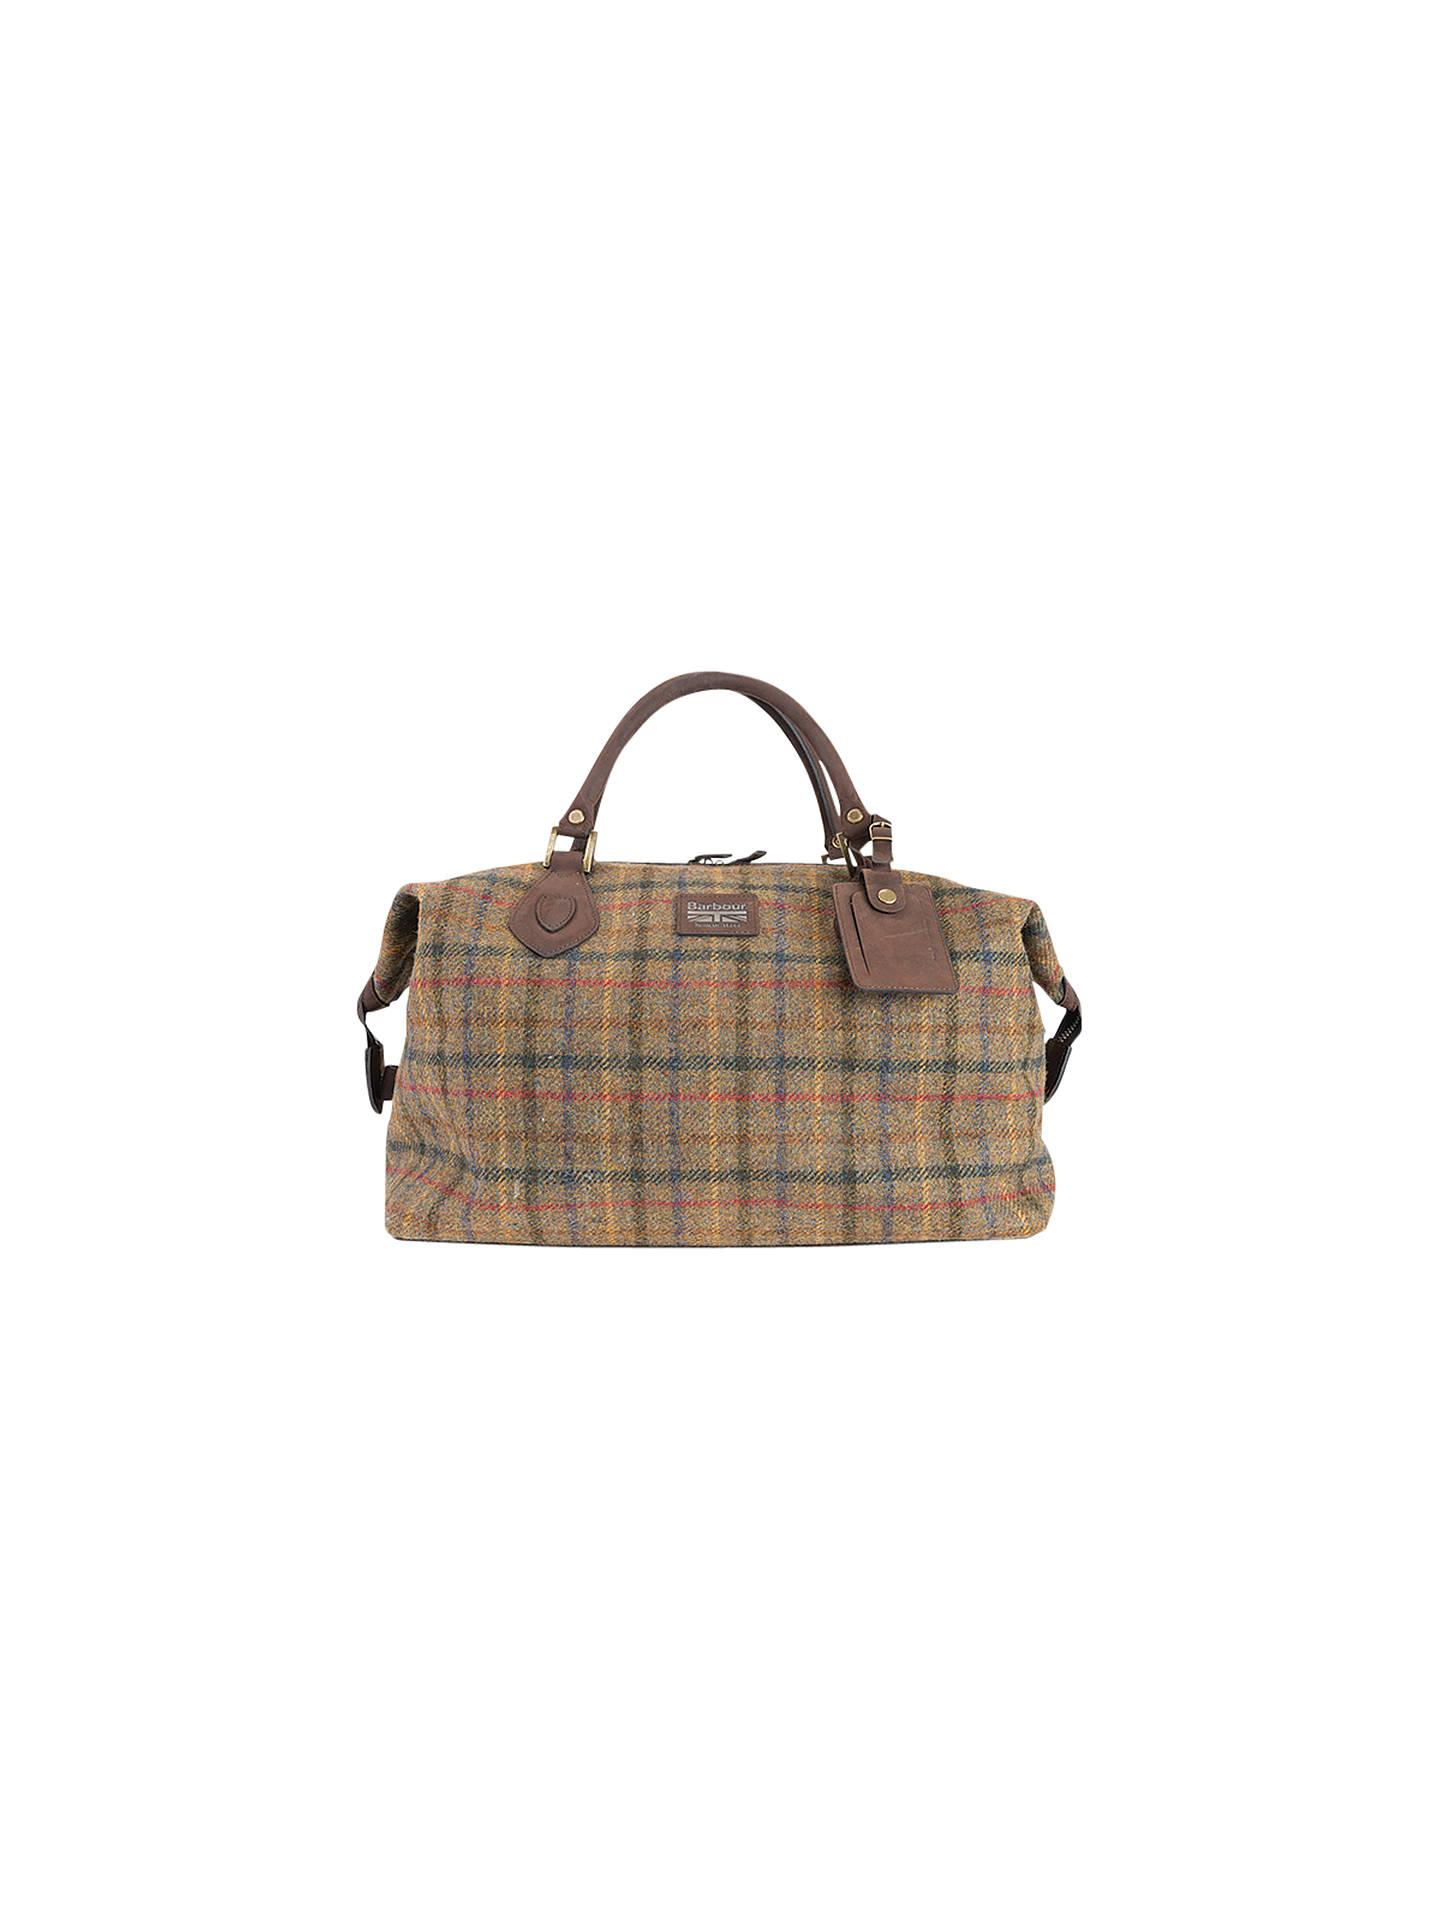 1c94d051634 BuyBarbour Tweed Explorer Bag, Olive Online at johnlewis.com